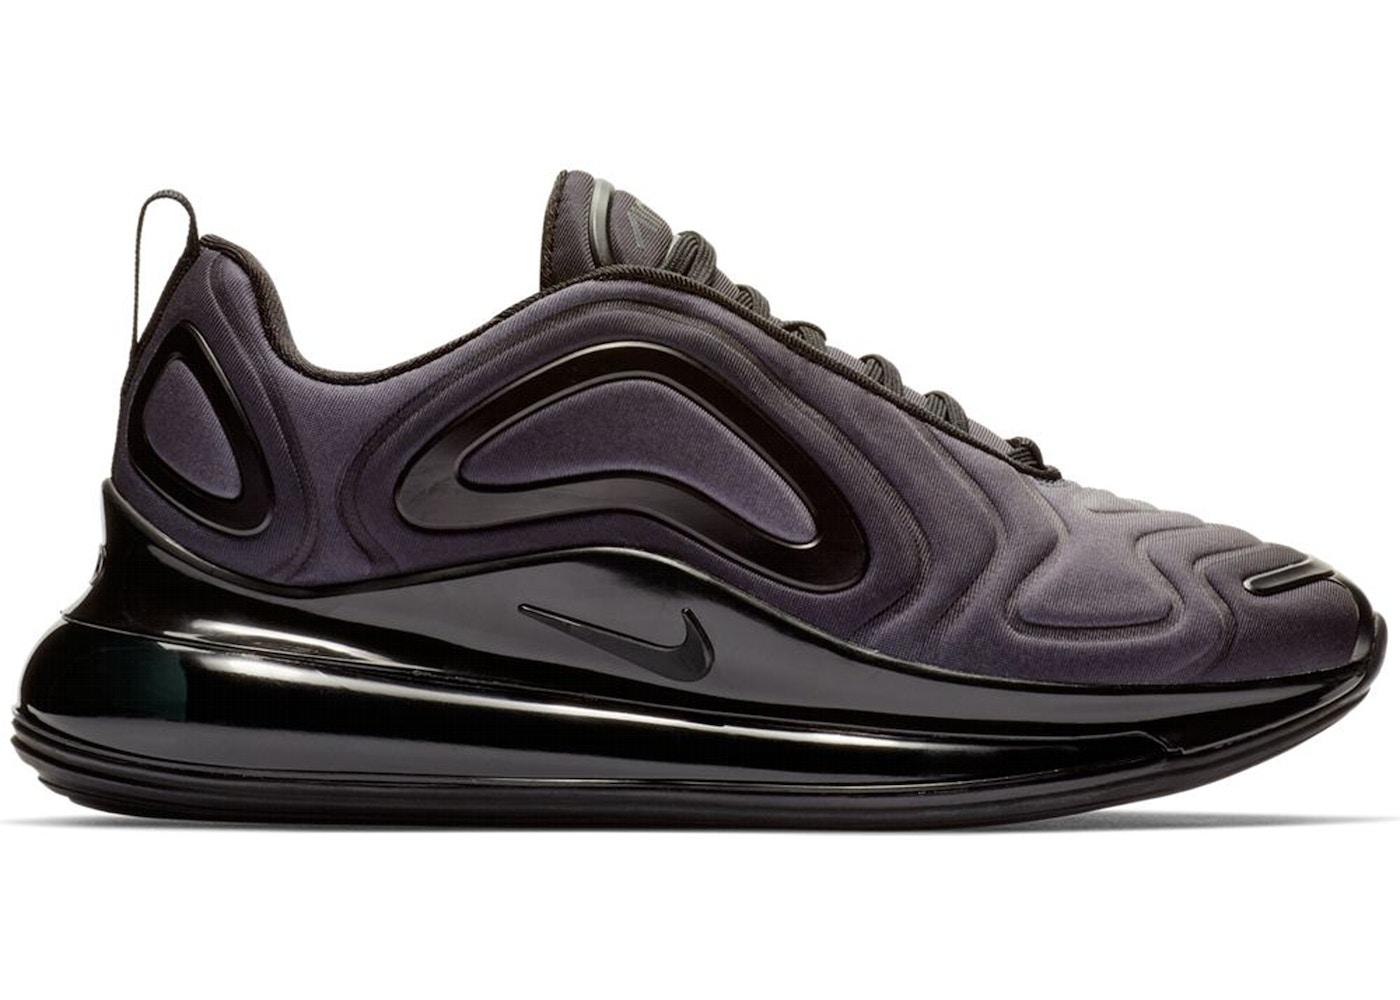 desarrollando ola Subordinar  Nike Air Max 720 Black Anthracite (W) - AR9293-003